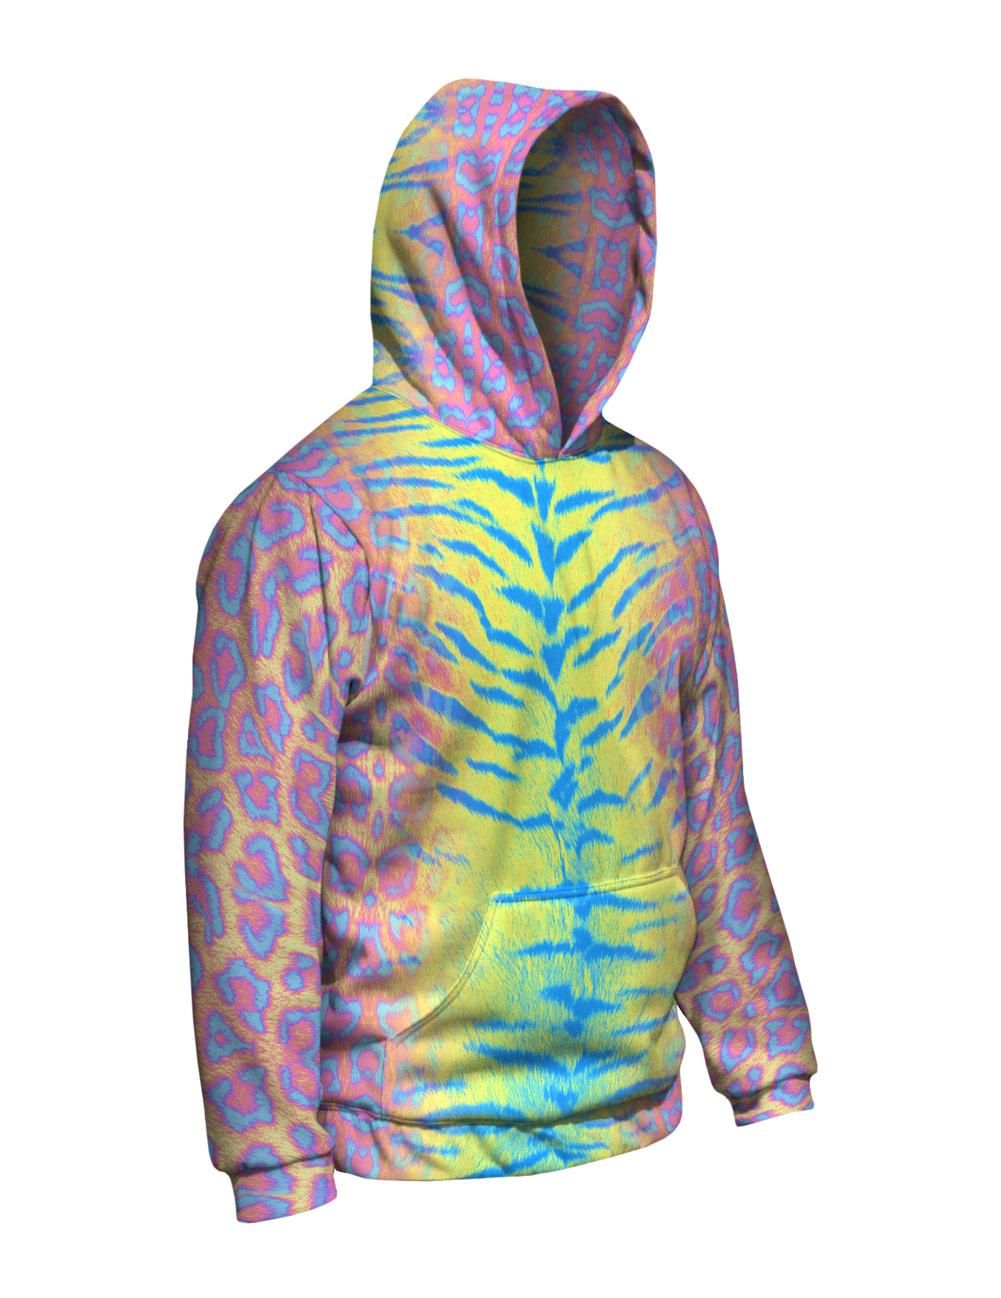 Yizzam- Tiger Leopard Skin rosa rosa Skin giallo blu - Nuovo Uomo Hoodie Sweater XS S M L bb2f0c